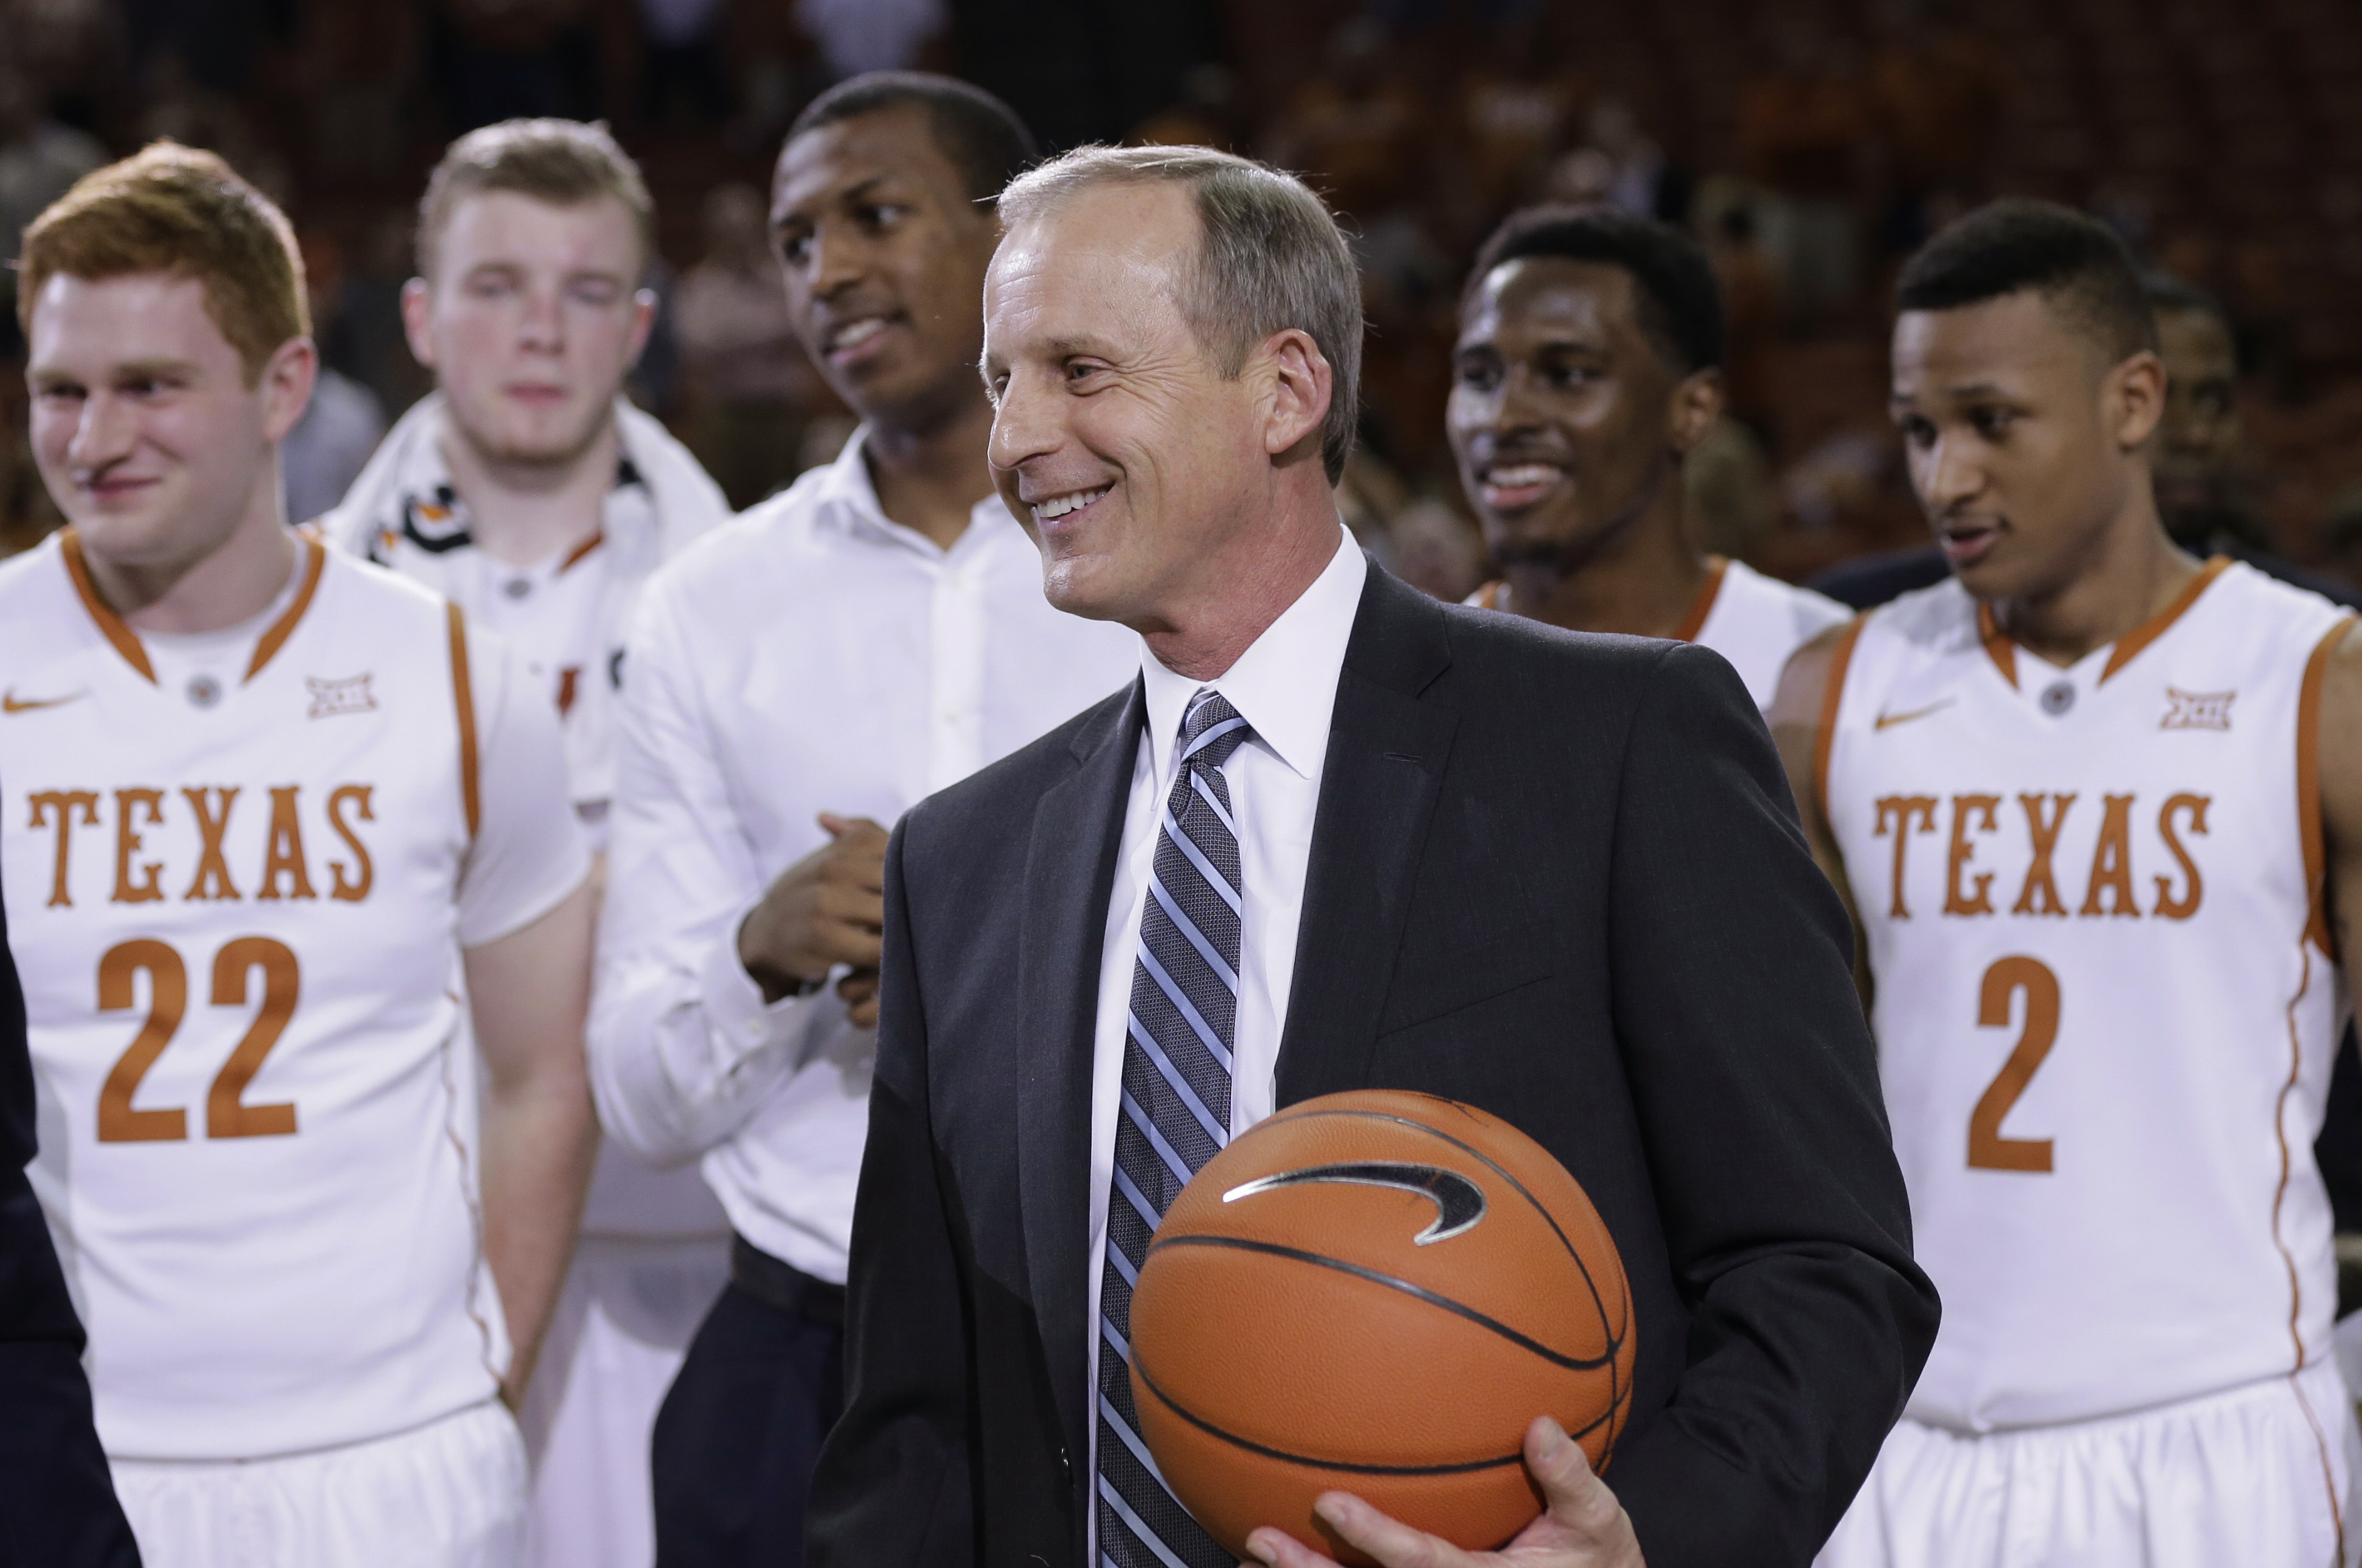 Texas coach Rick Barnes is given a game ball following his team's NCAA college basketball game against TCU, Wednesday, Feb. 11, 2015, in Austin, Texas. Texas won 66-43, giving Barnes his 600th win. (AP Photo/Eric Gay)